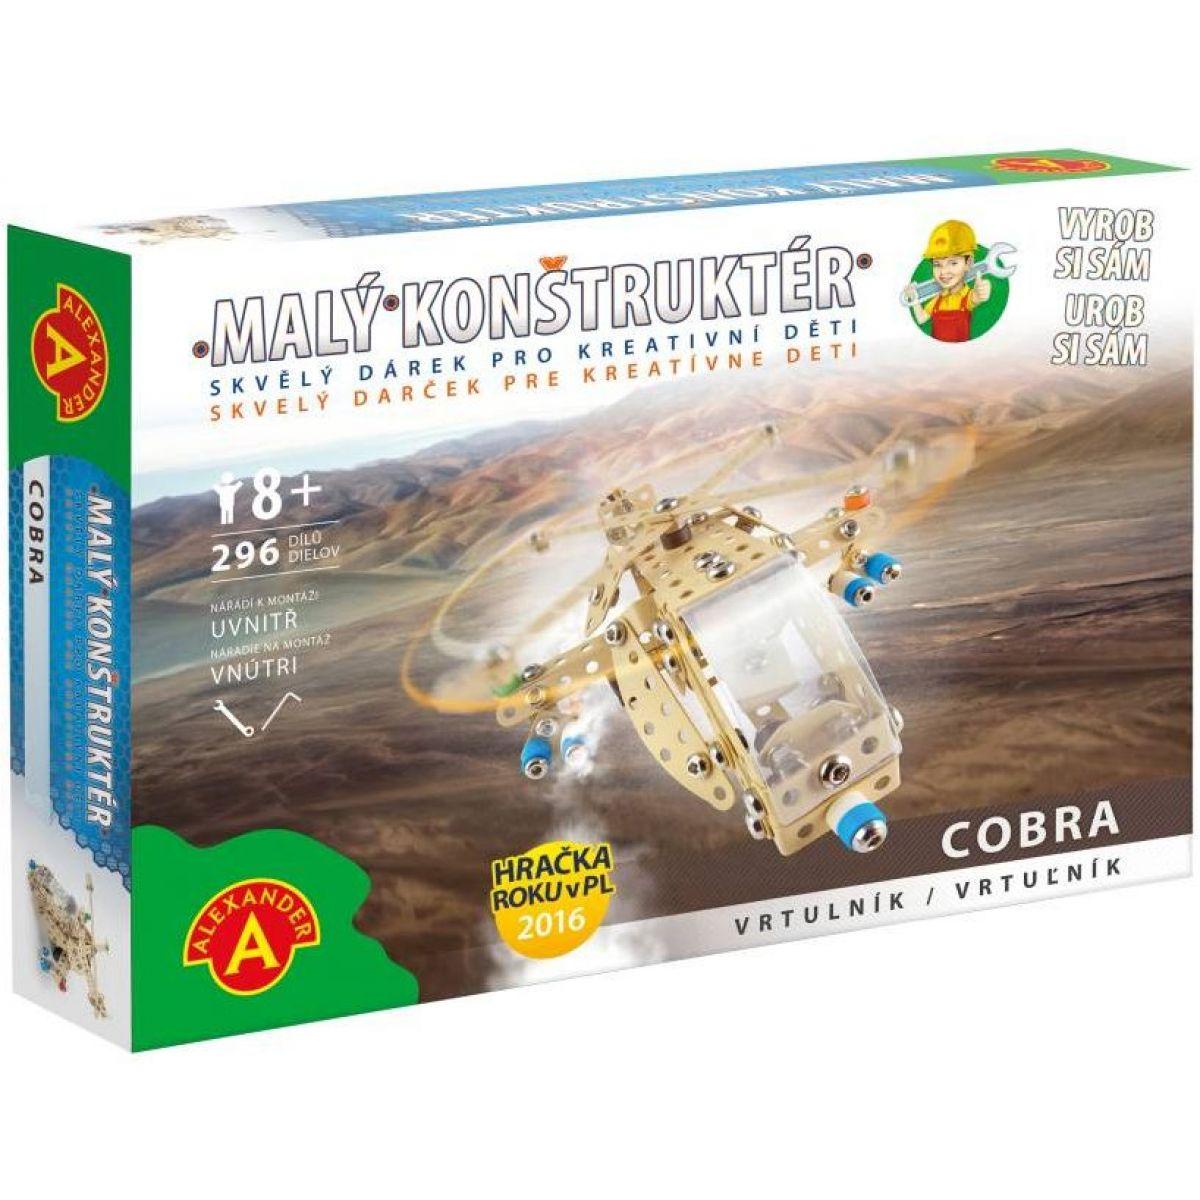 Alexander Malý konstruktér Cobra Vrtulník